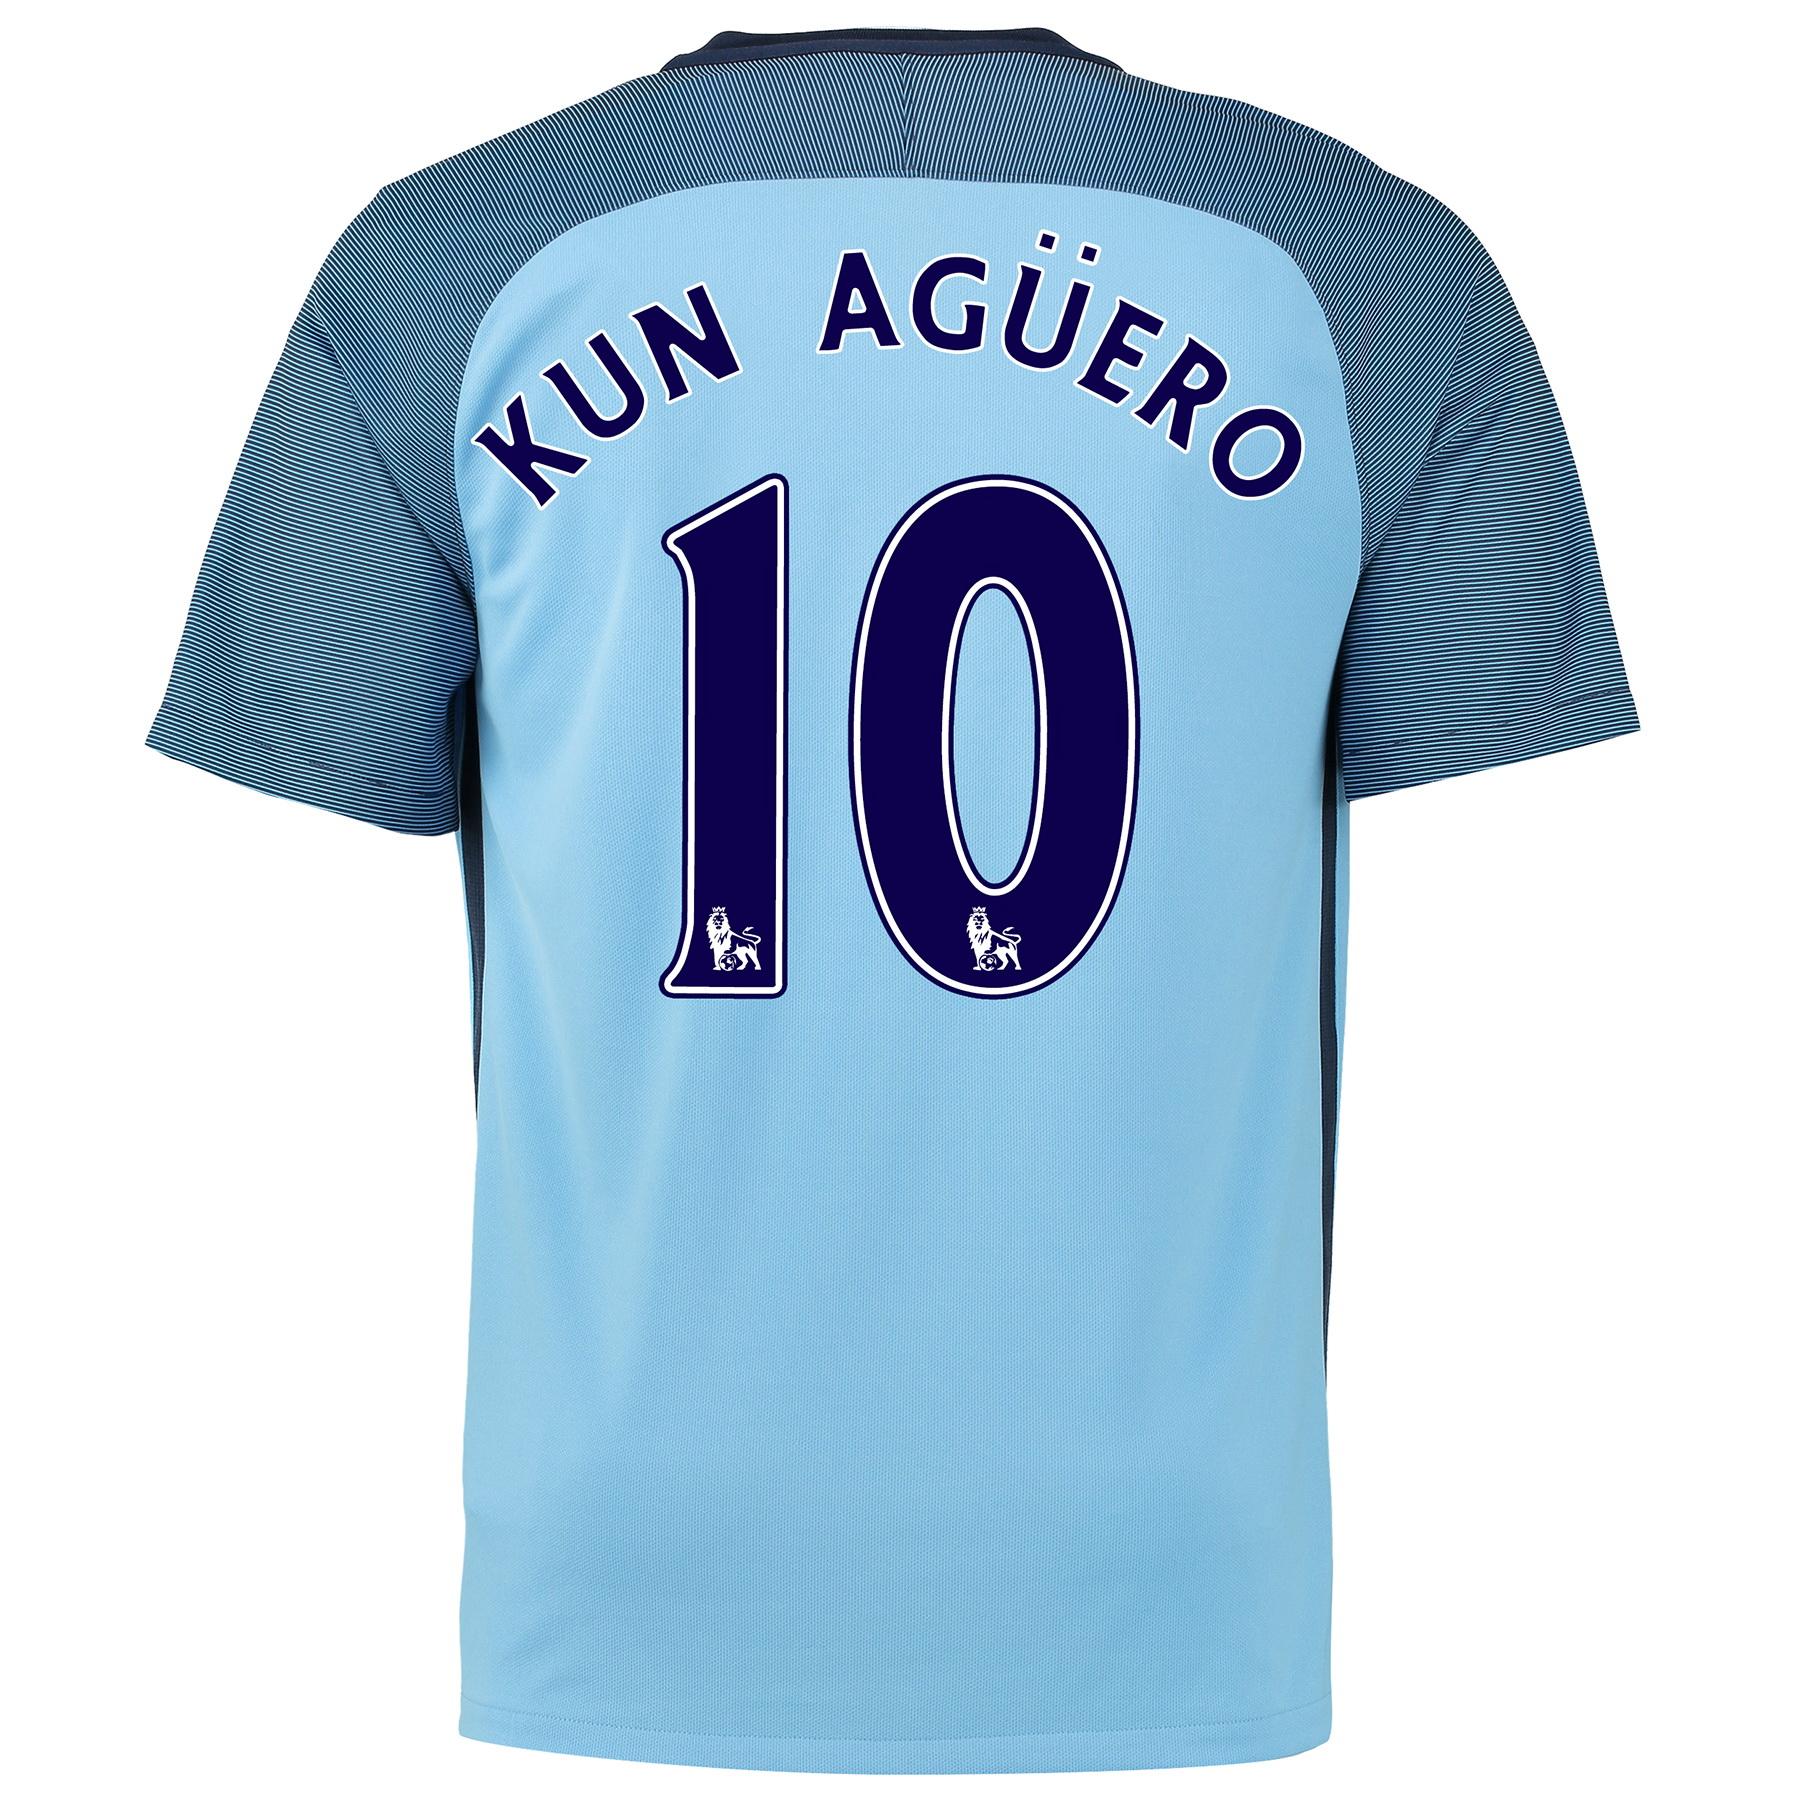 Manchester City Home Shirt 2016-17 - Kids with Kun Aguero  10 printing